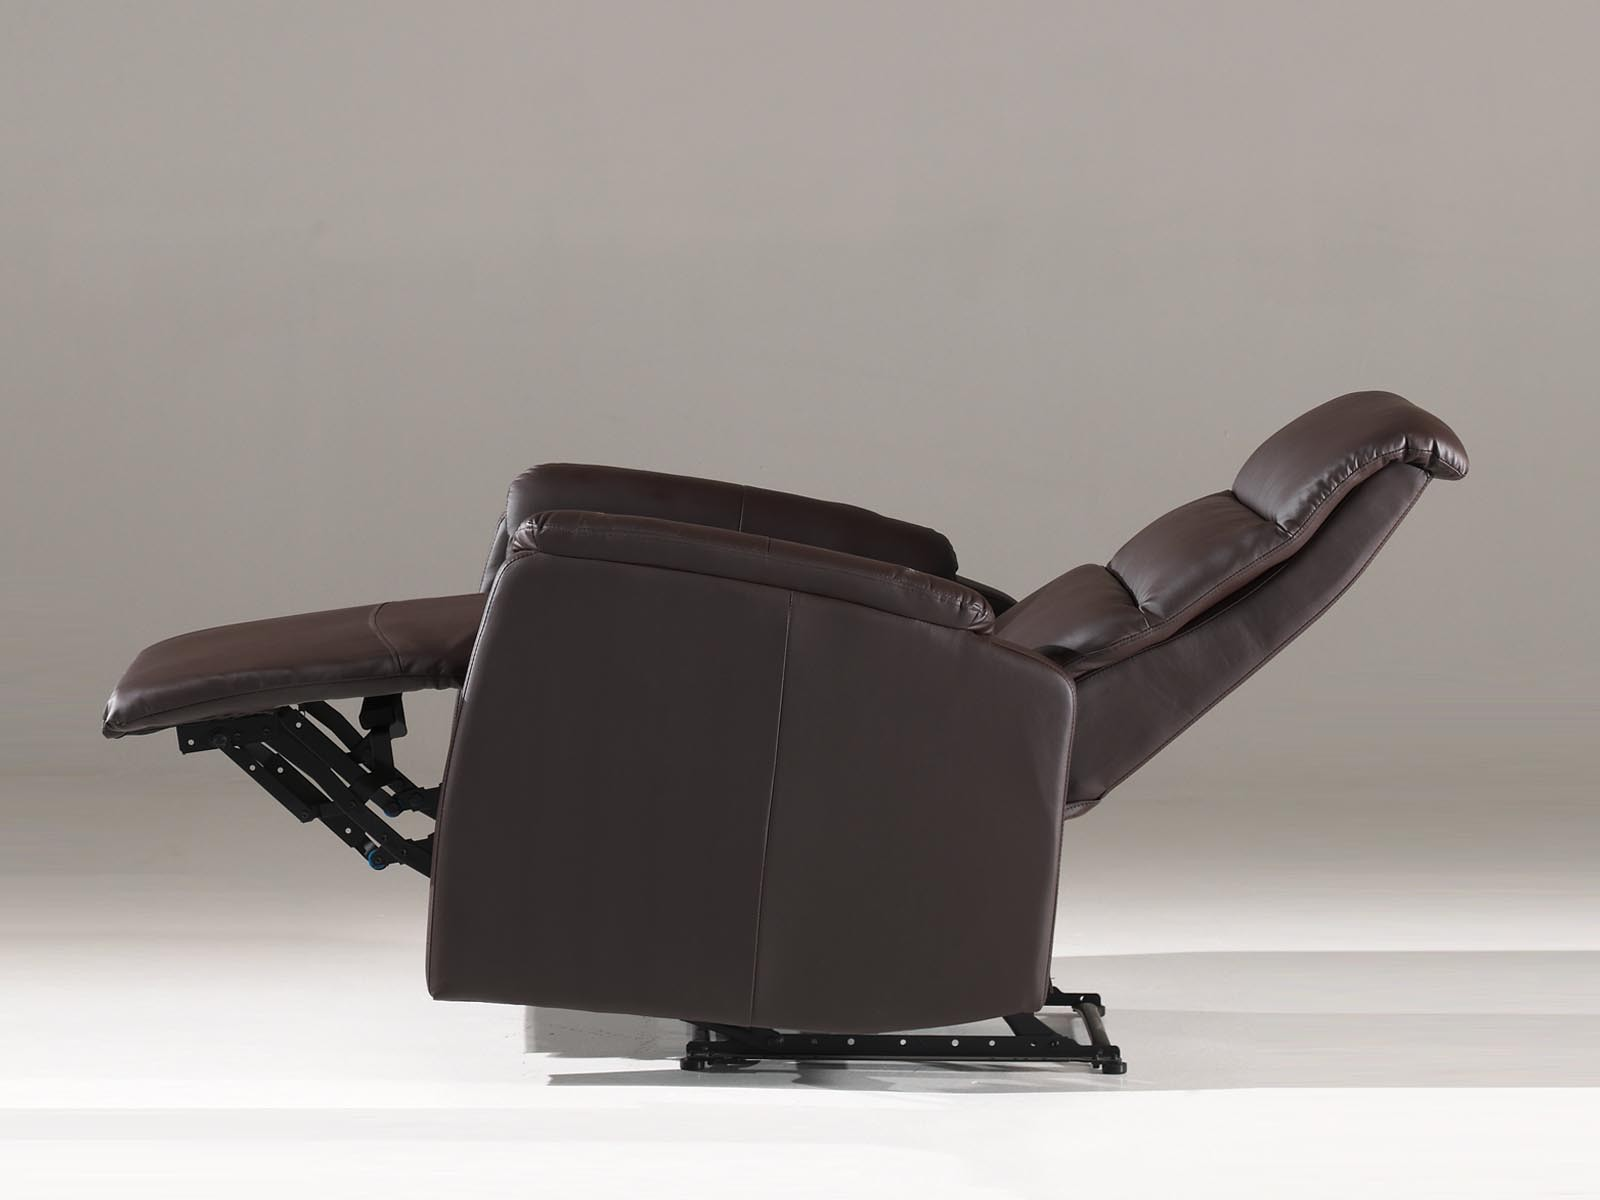 Fauteuil Relax Bruin.Comfortabele Relax Stoel Bruin Aktie Wonen Nl